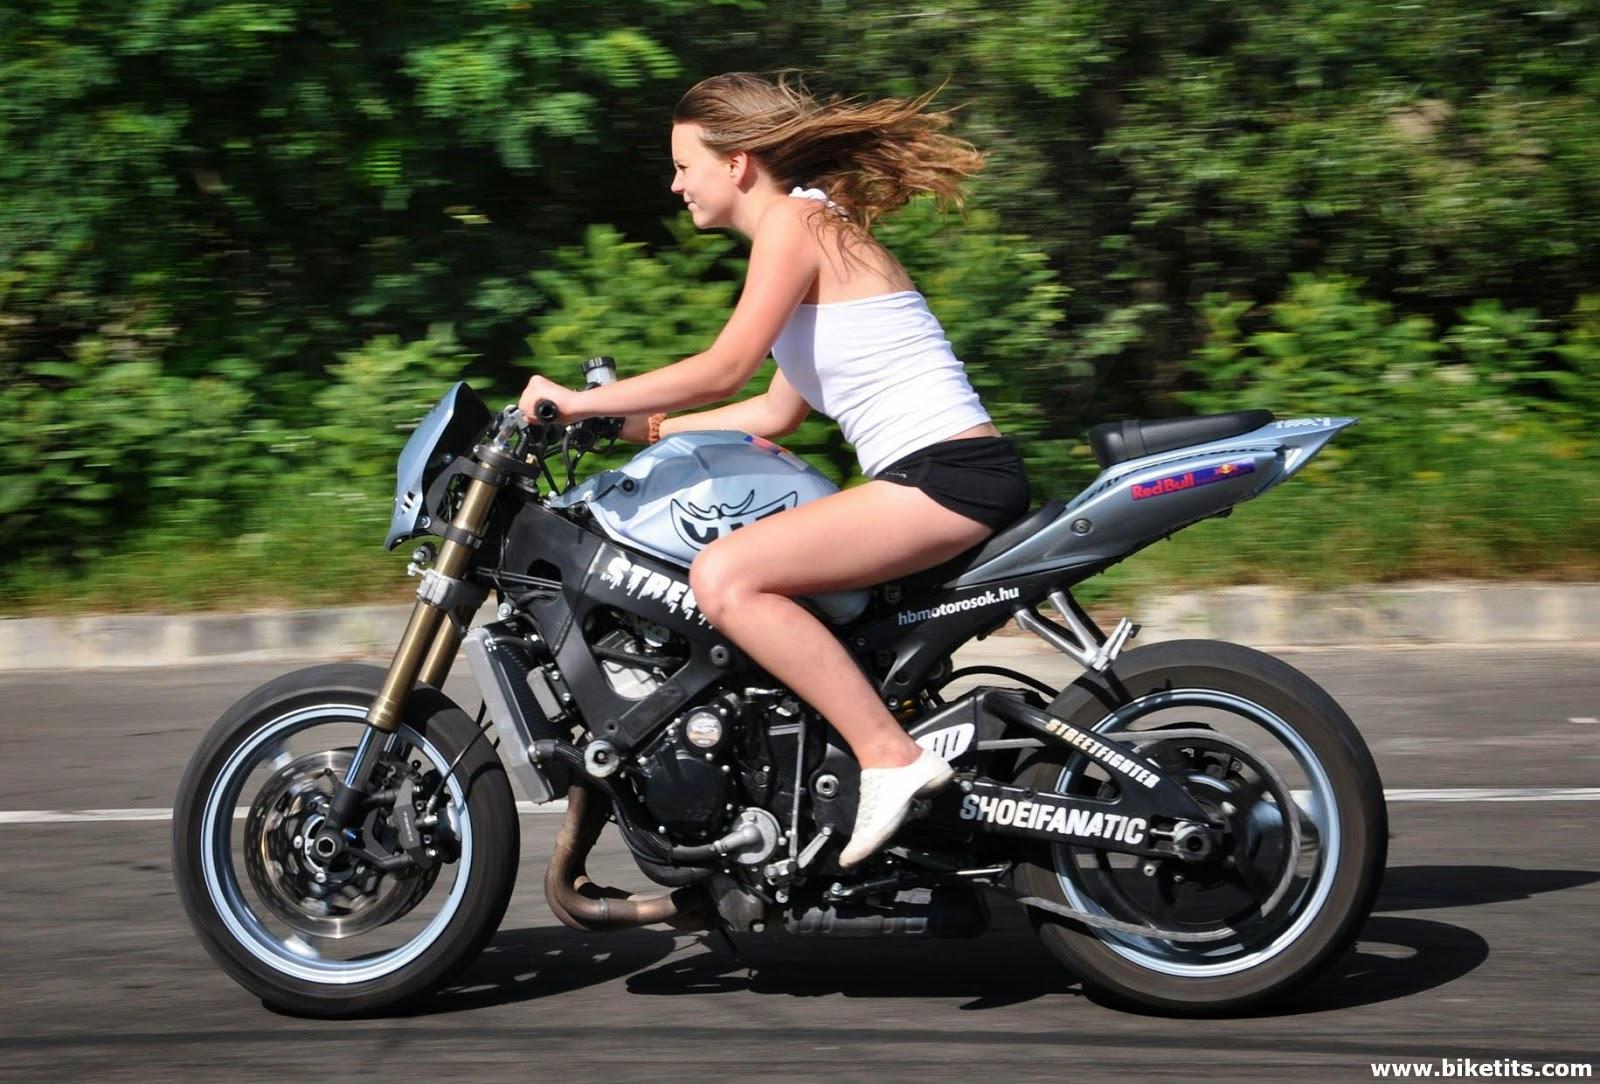 PIRDOT Kumpulan Foto Cewek Cantik Bikers Motor Gede Moge